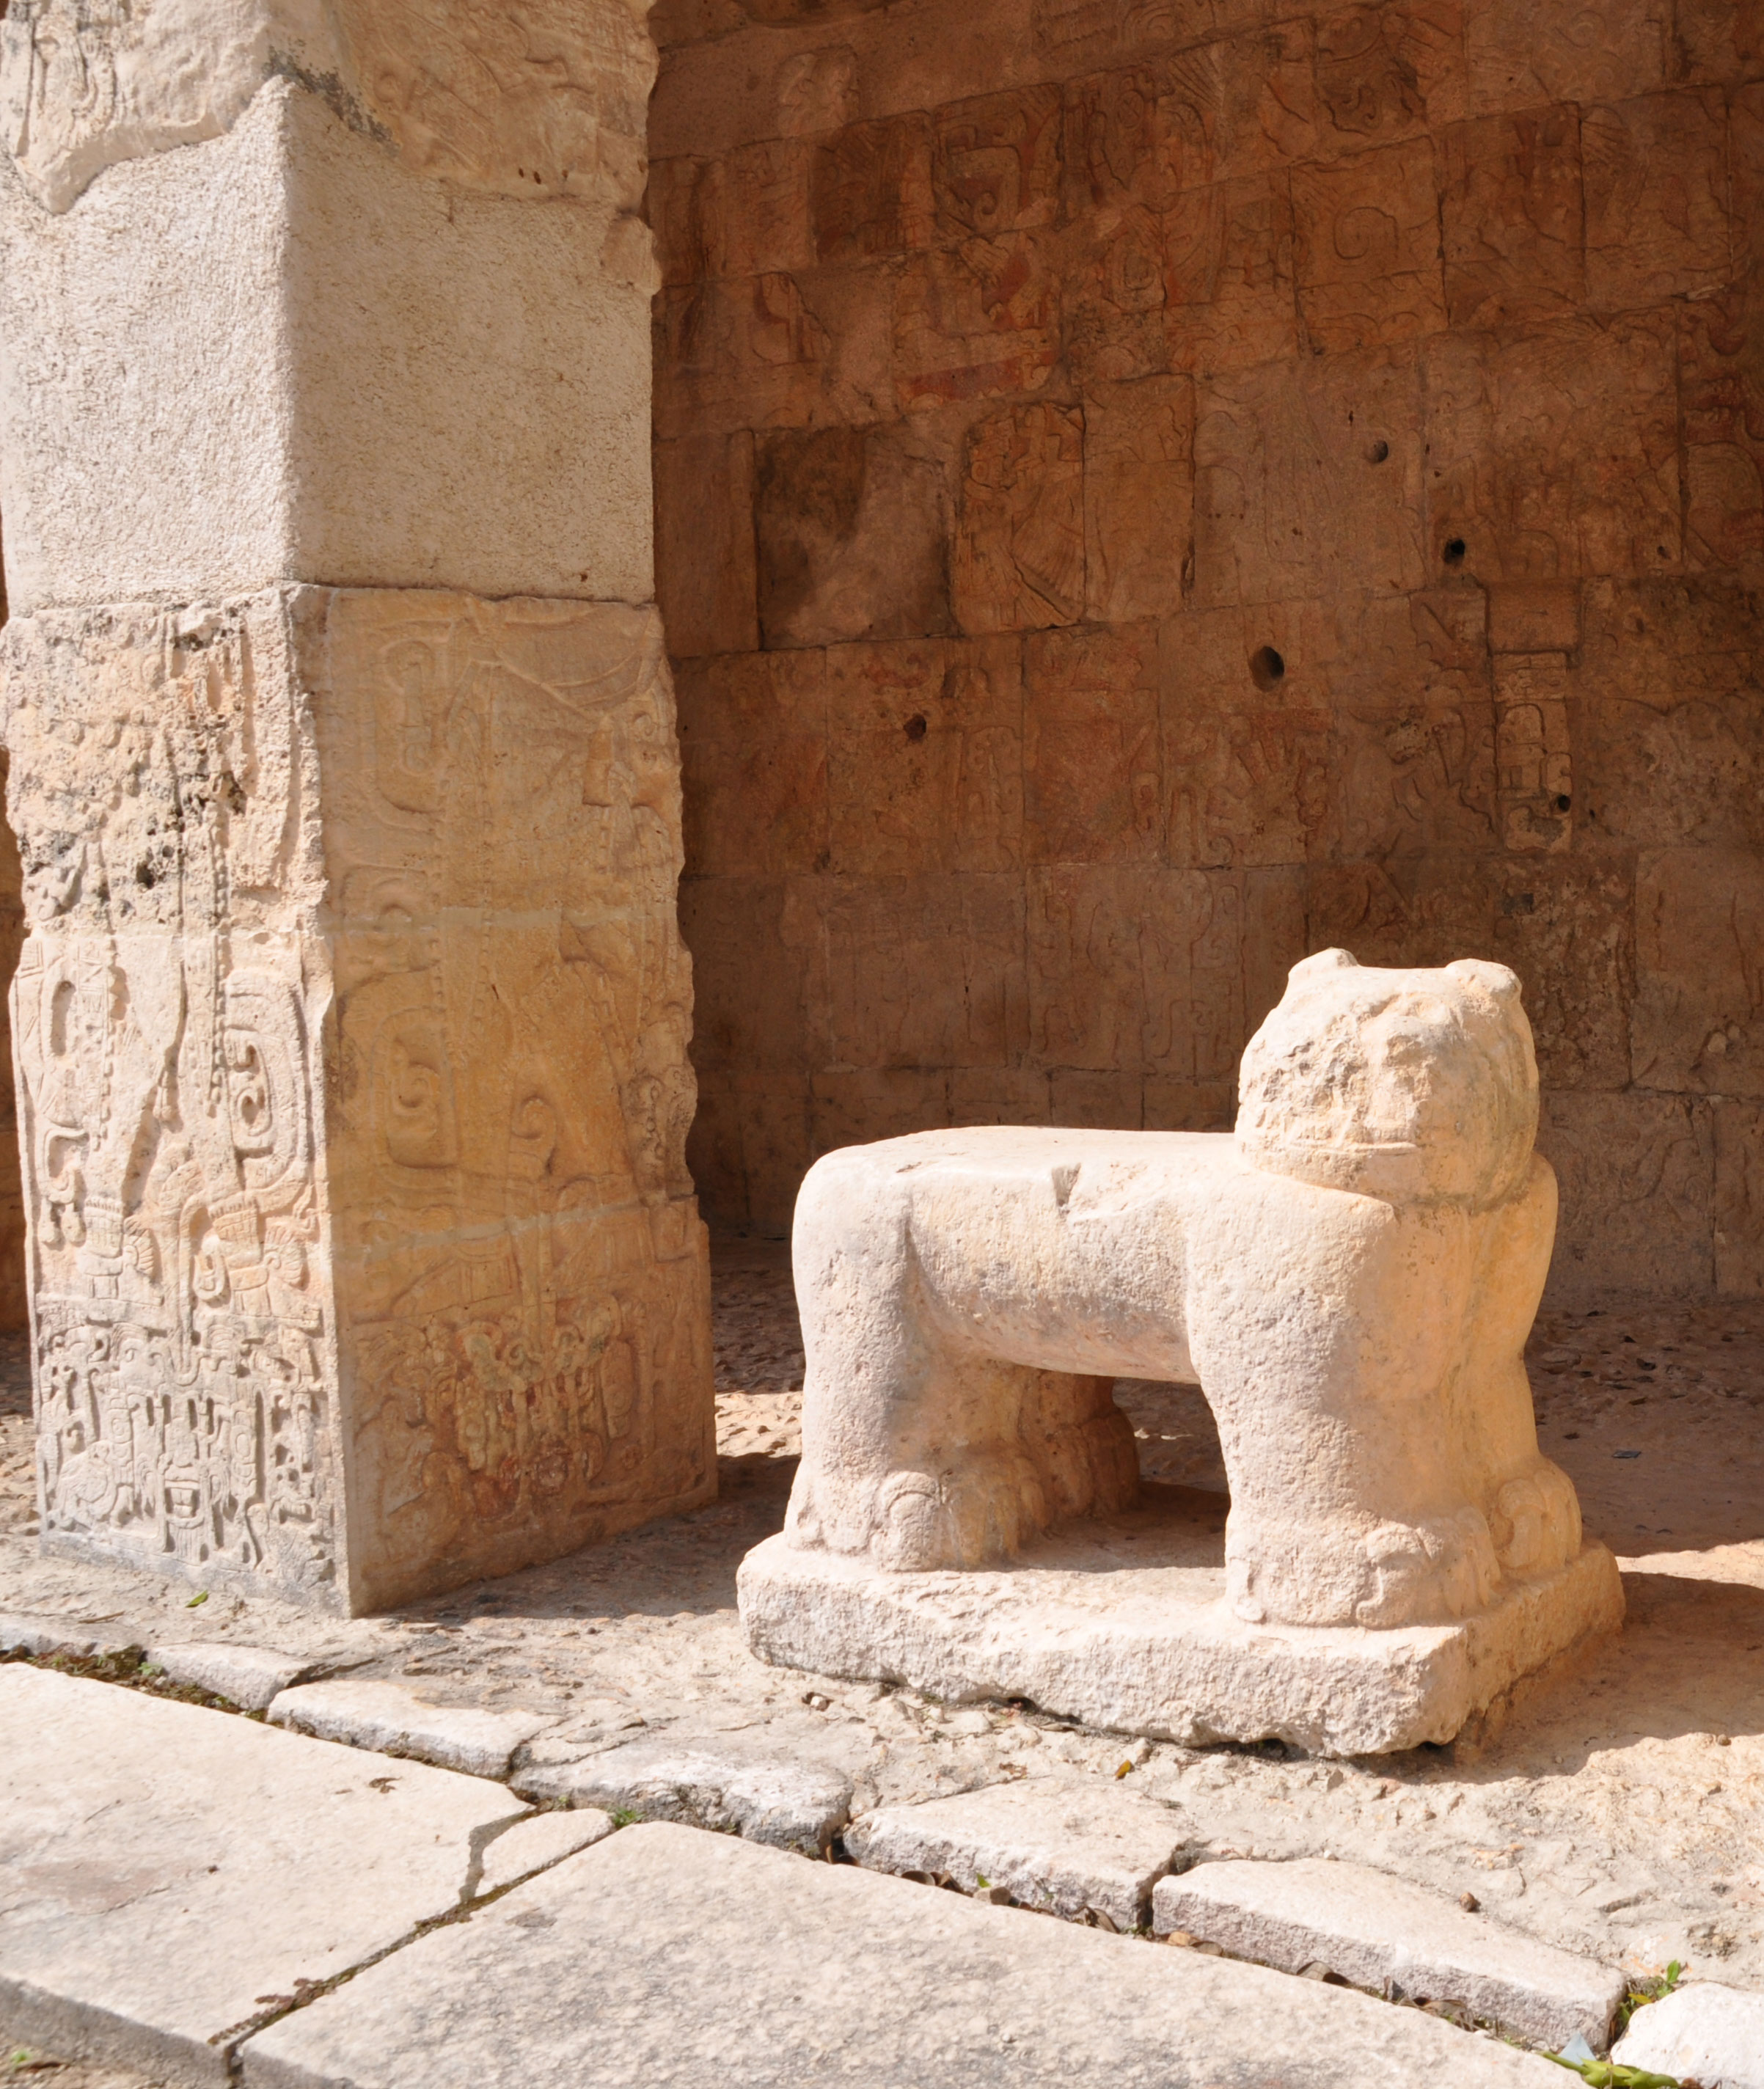 Details of massive Mayan site of Chichen Itza in Yucatan